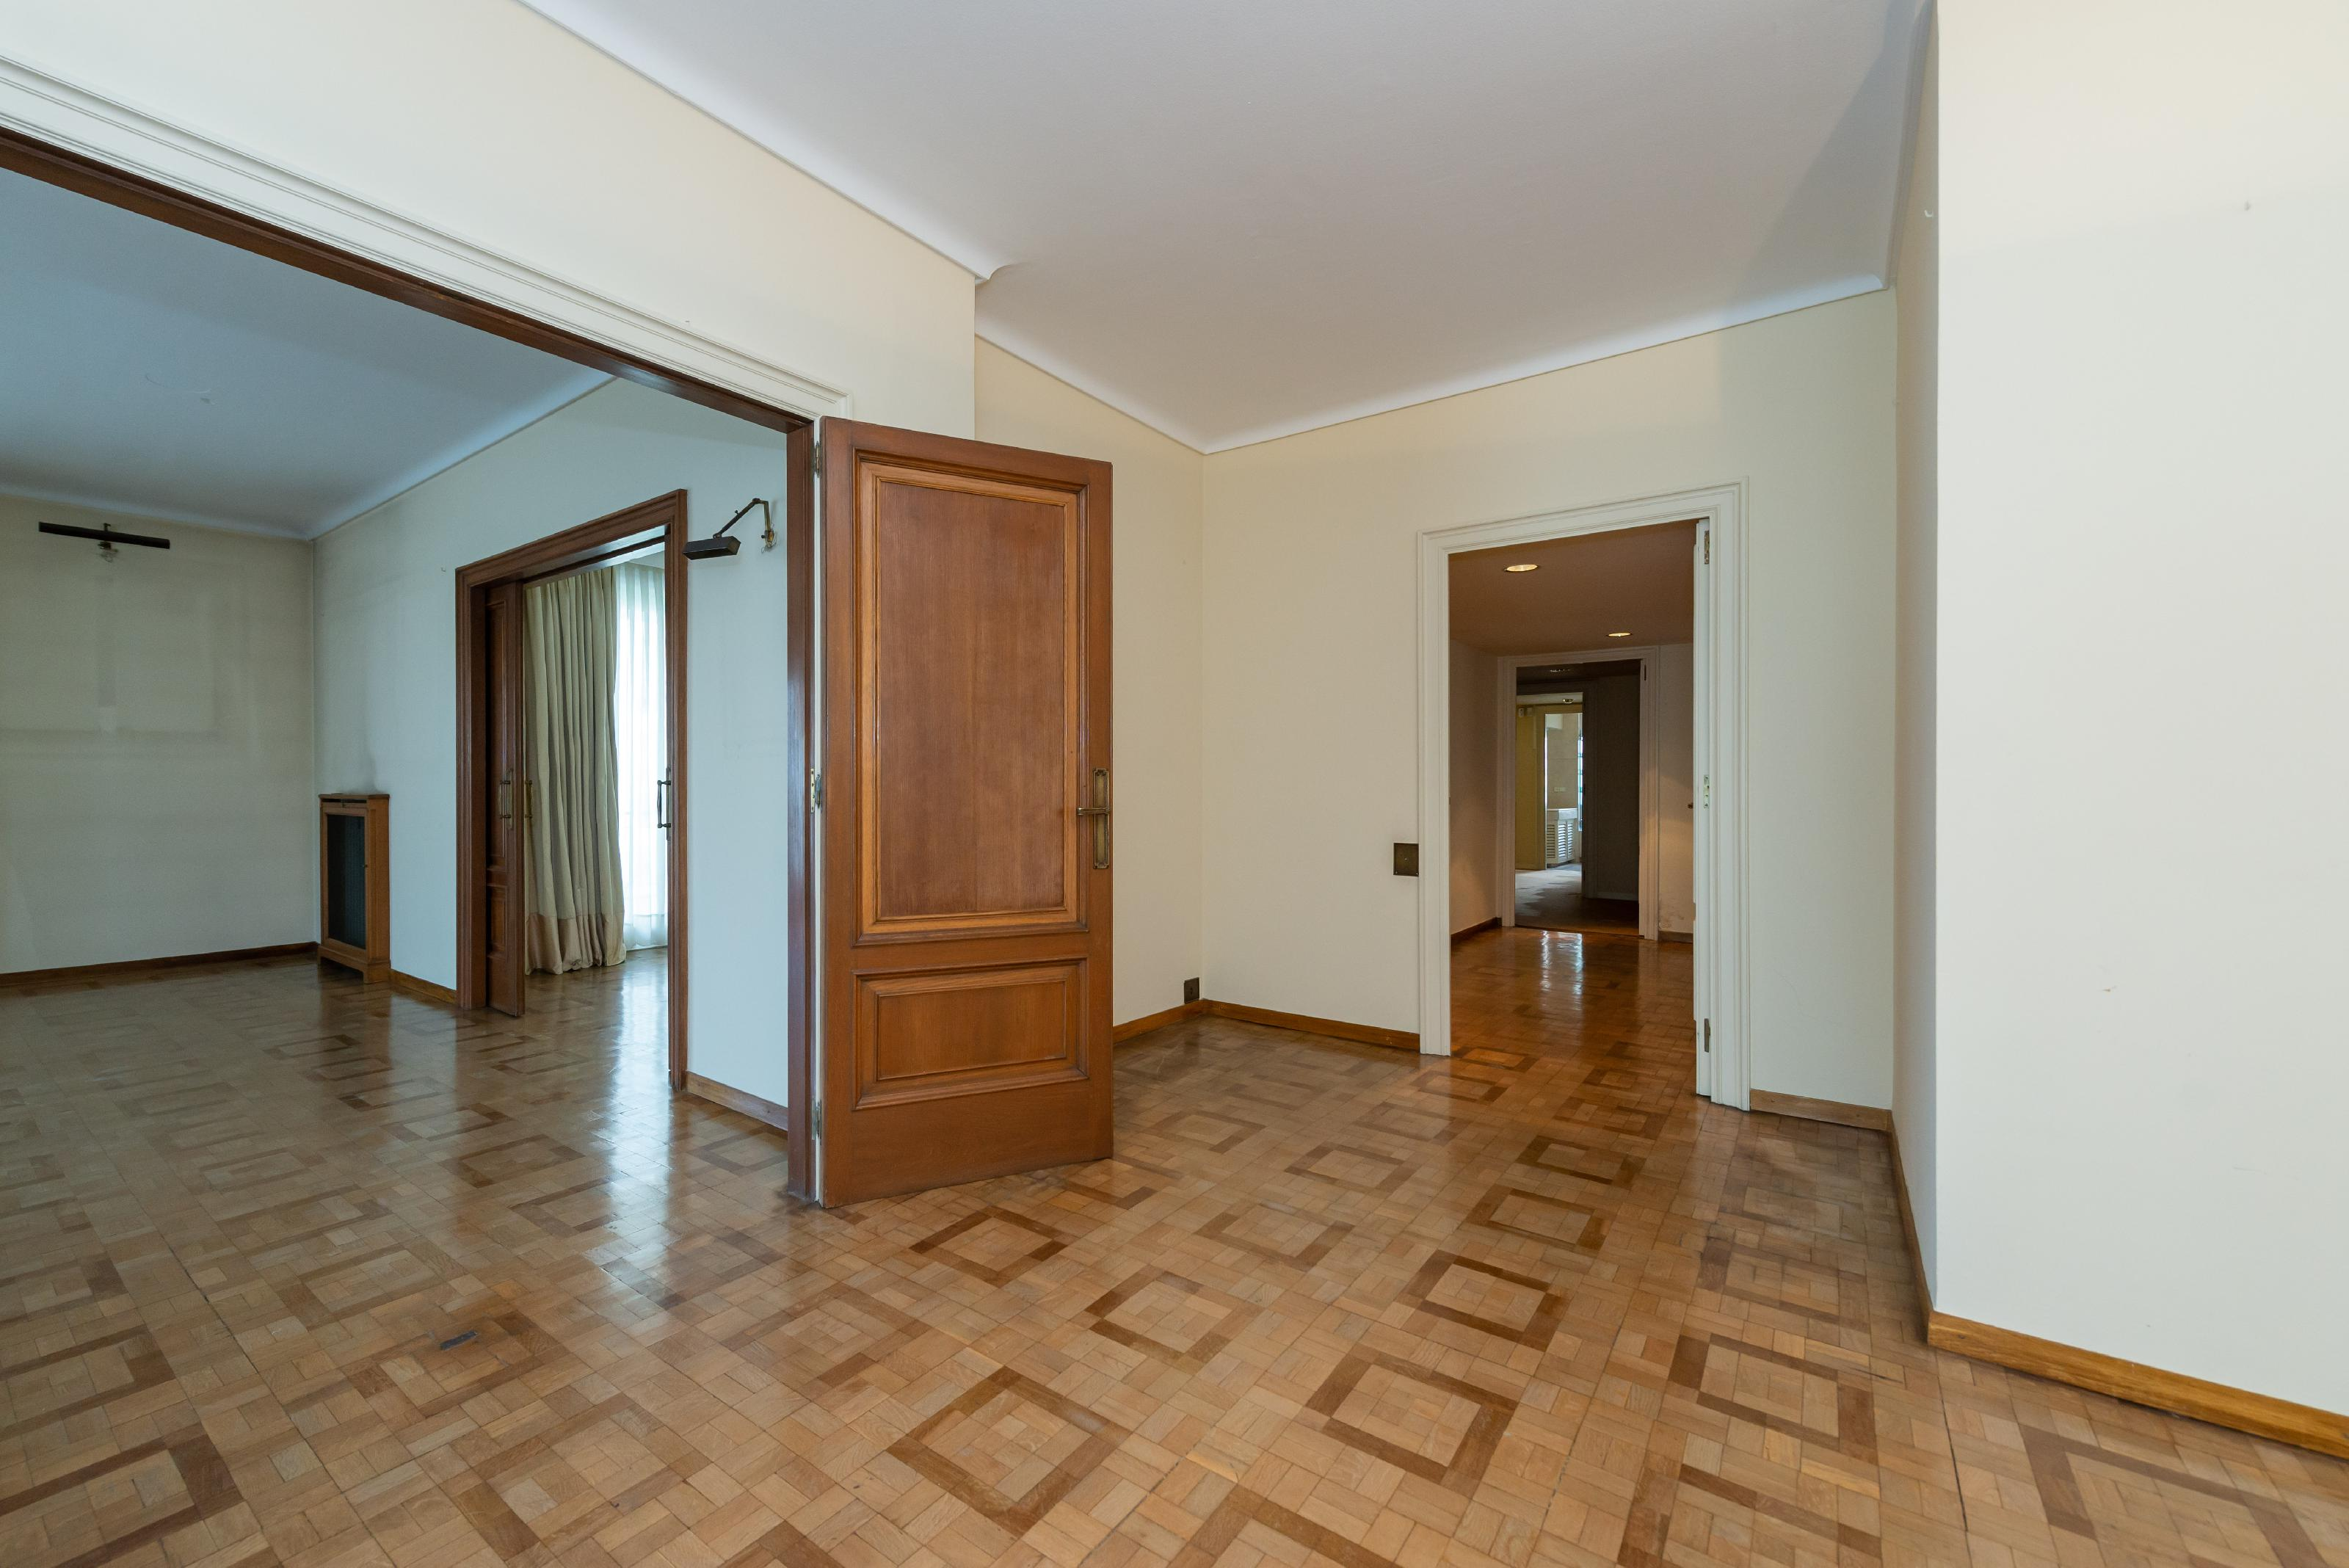 253581 Piso en venda en Sarrià-Sant Gervasi, Sant Gervasi-Galvany 37